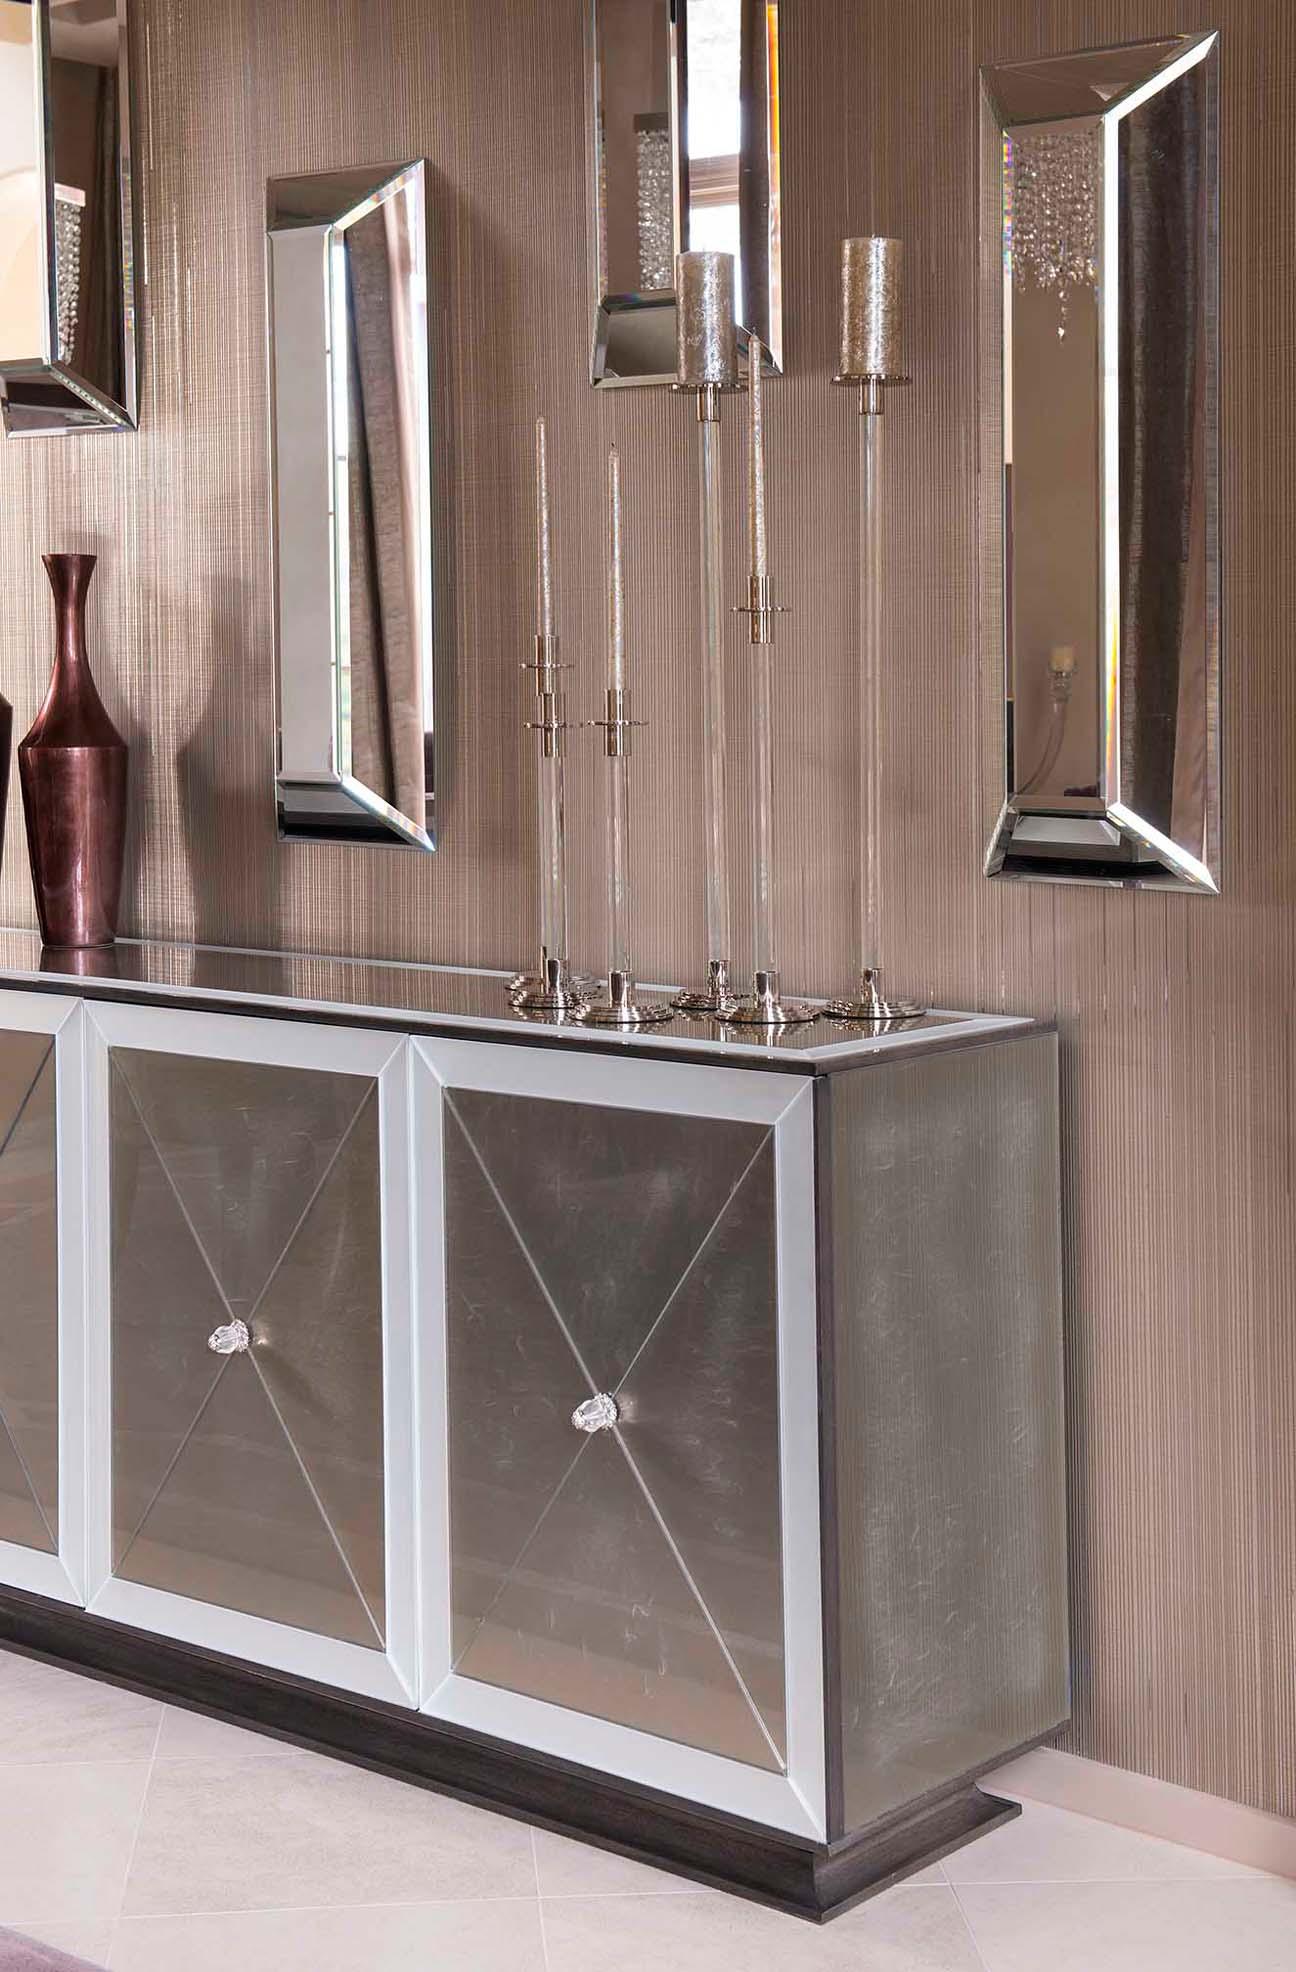 Contemporary Style Home-Dallas Design Group-10-1 Kindesign